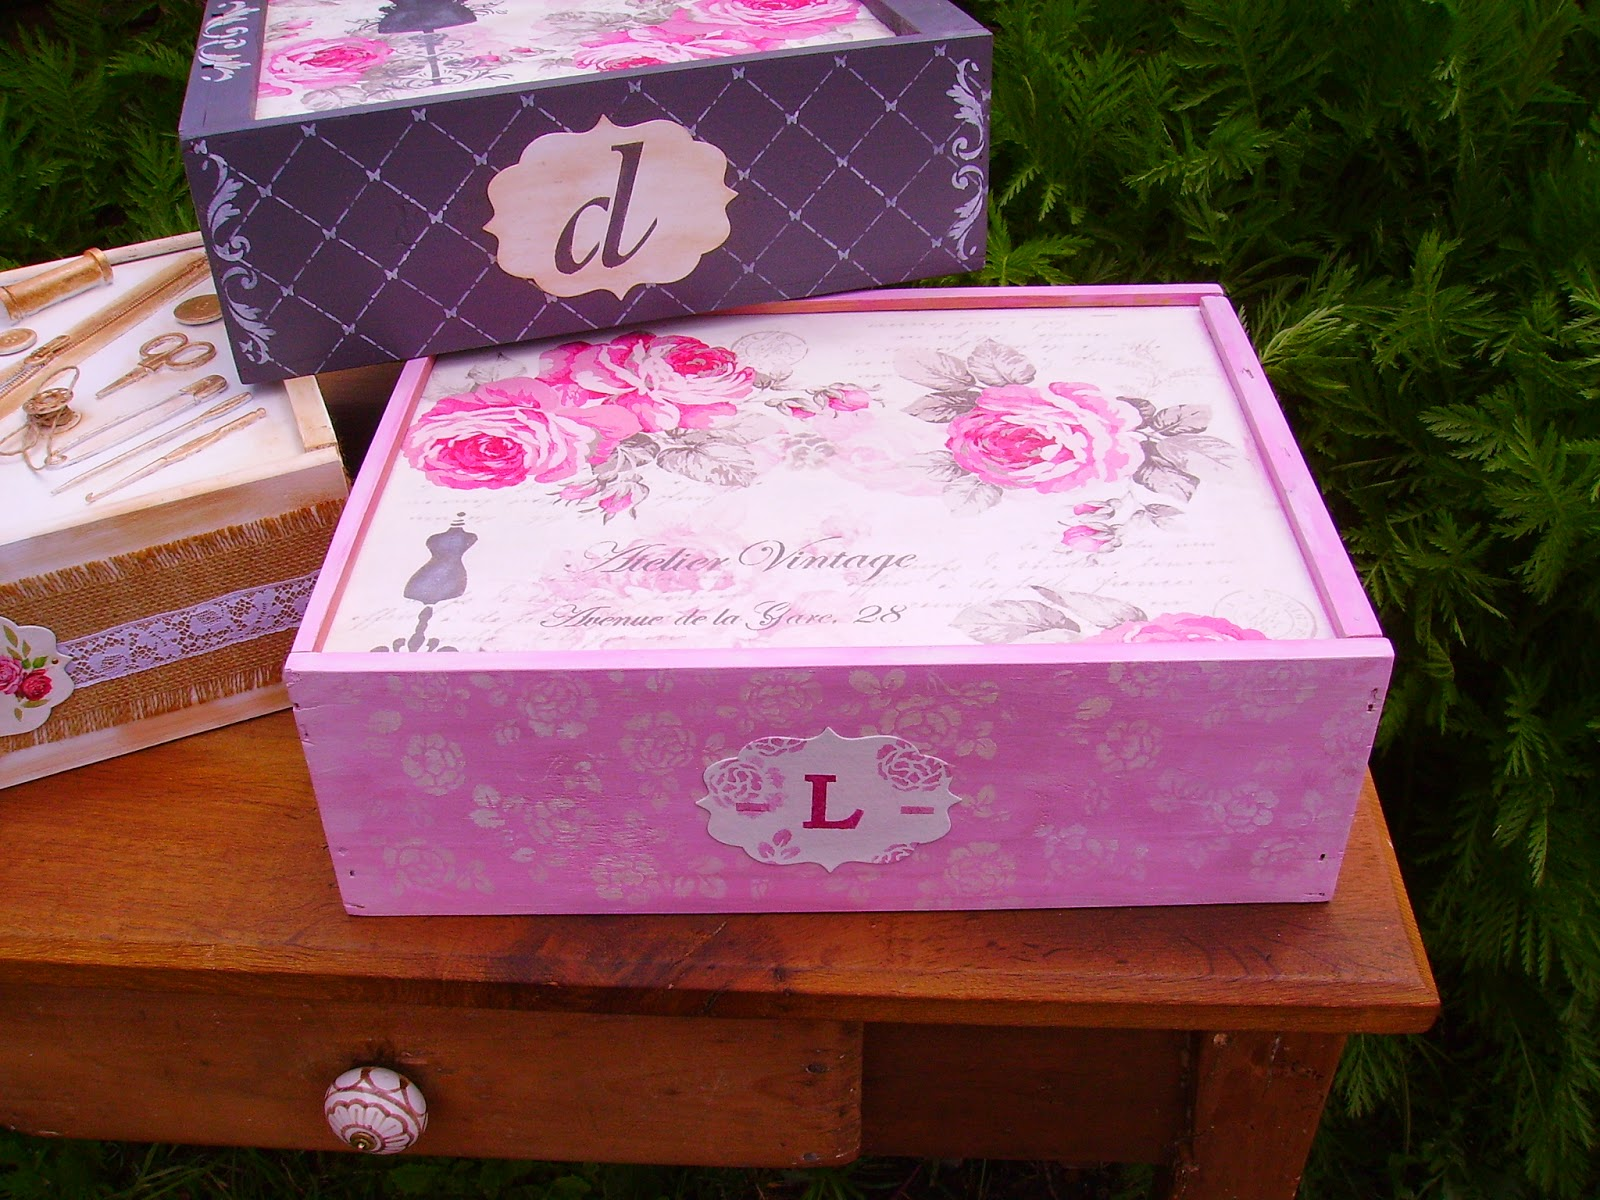 Retazos de madera cajas de vino - Cajas de vino de madera decoradas ...